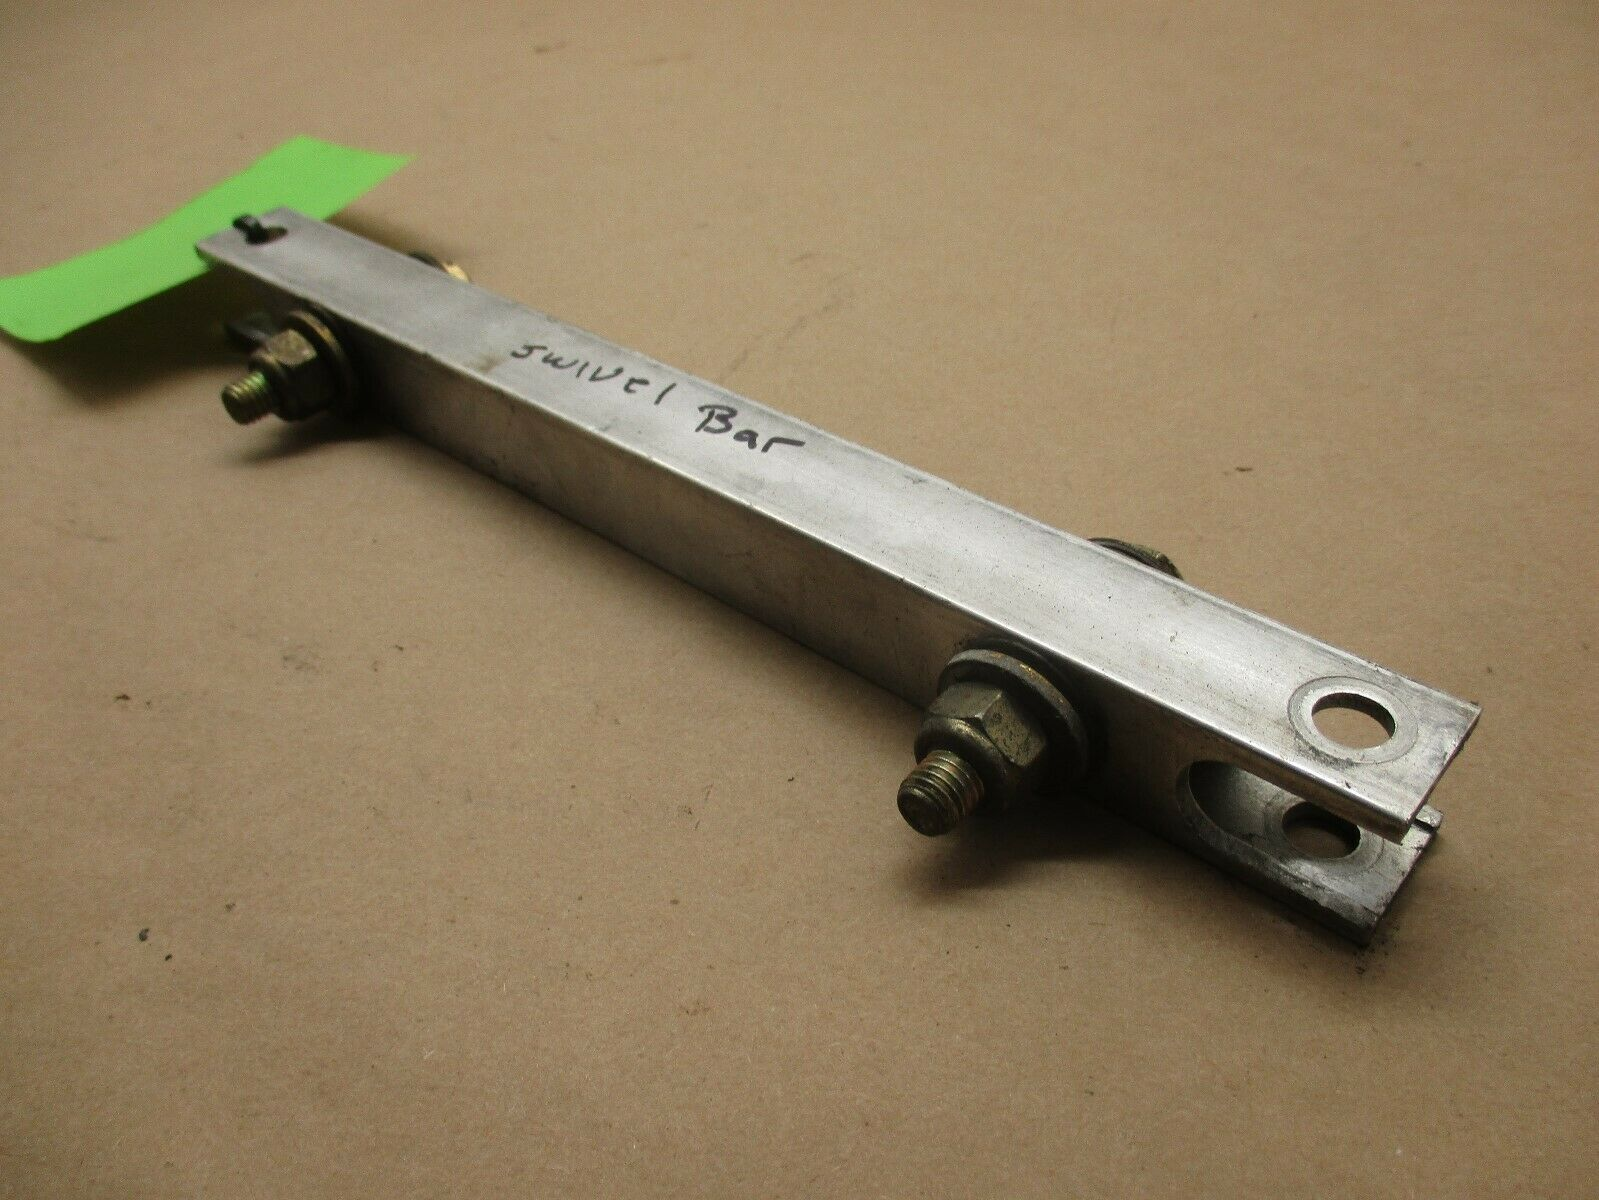 2004 Ski-Doo Summit 800R 159 HM Xtreme Steering Swivel Bar 506151328 (0305)